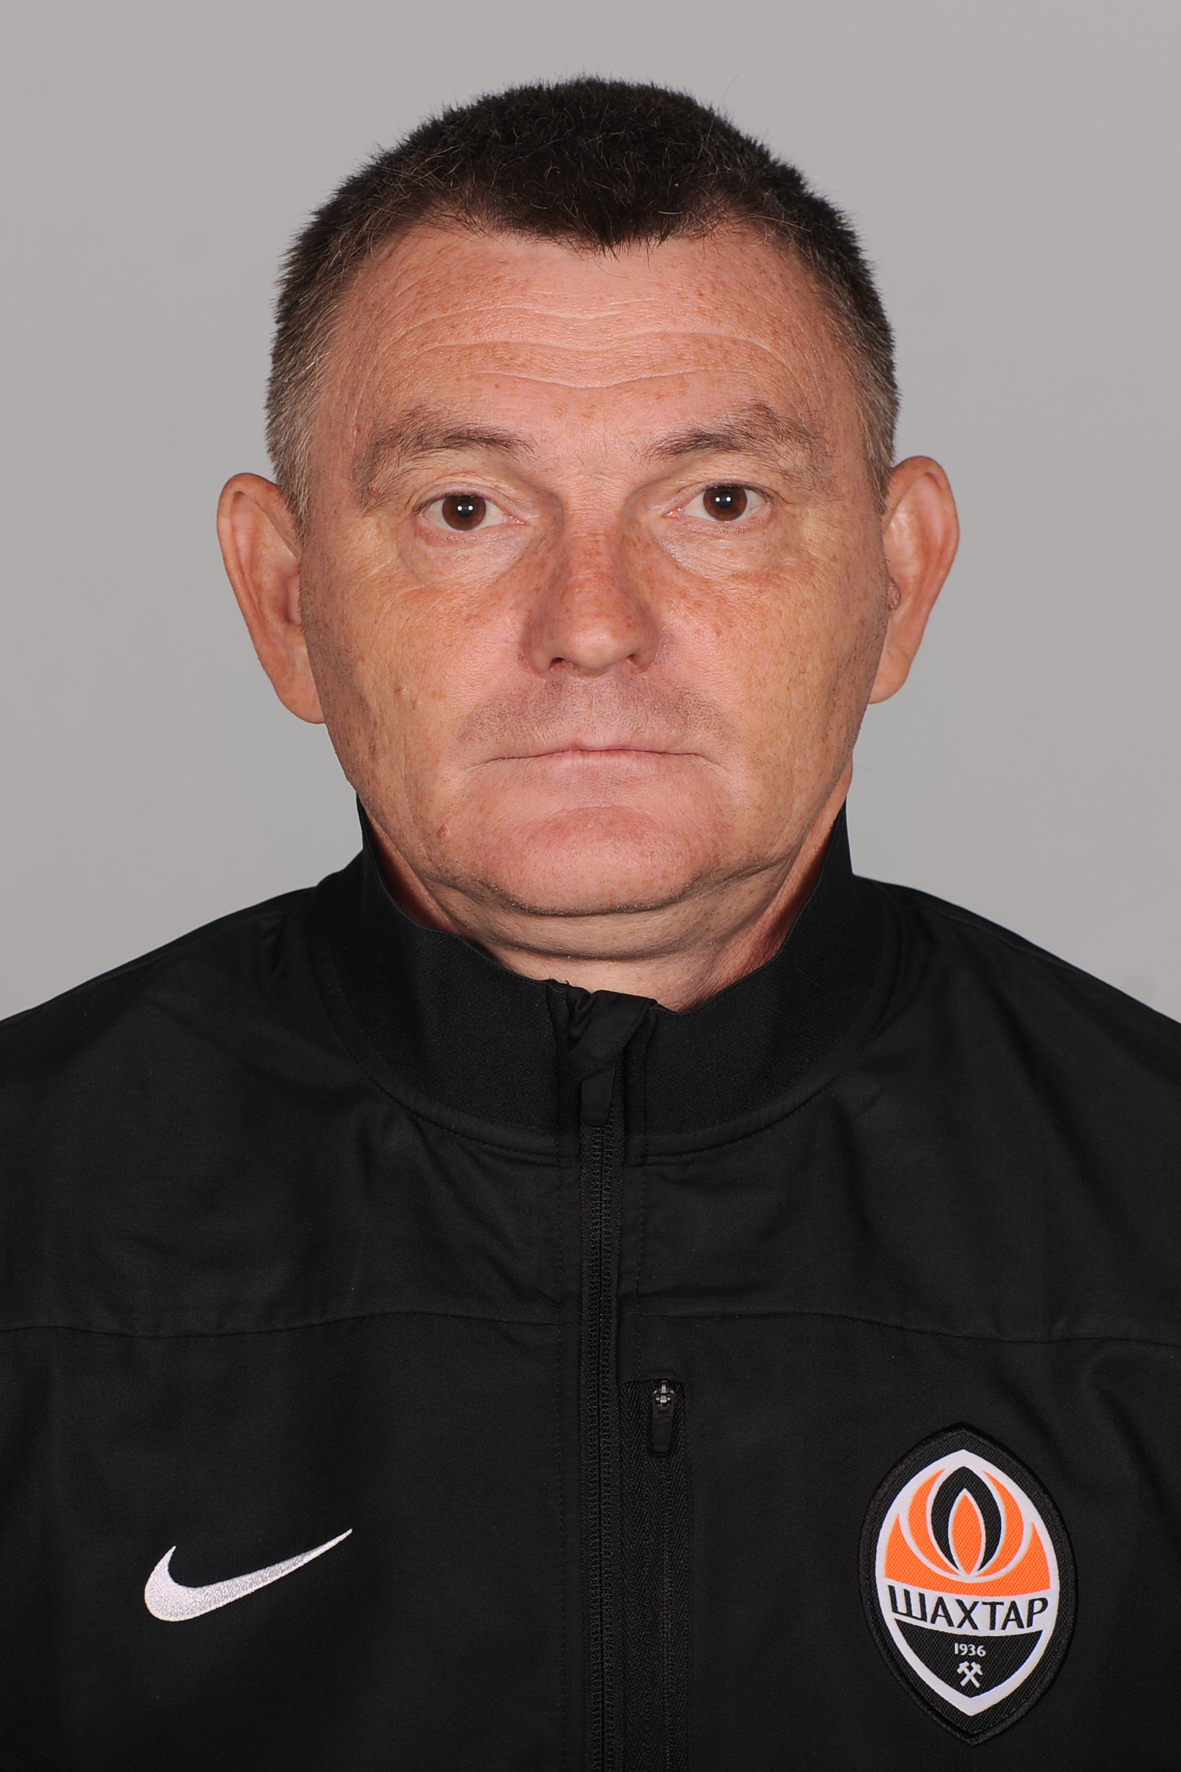 Виниченко Владимир Леонидович